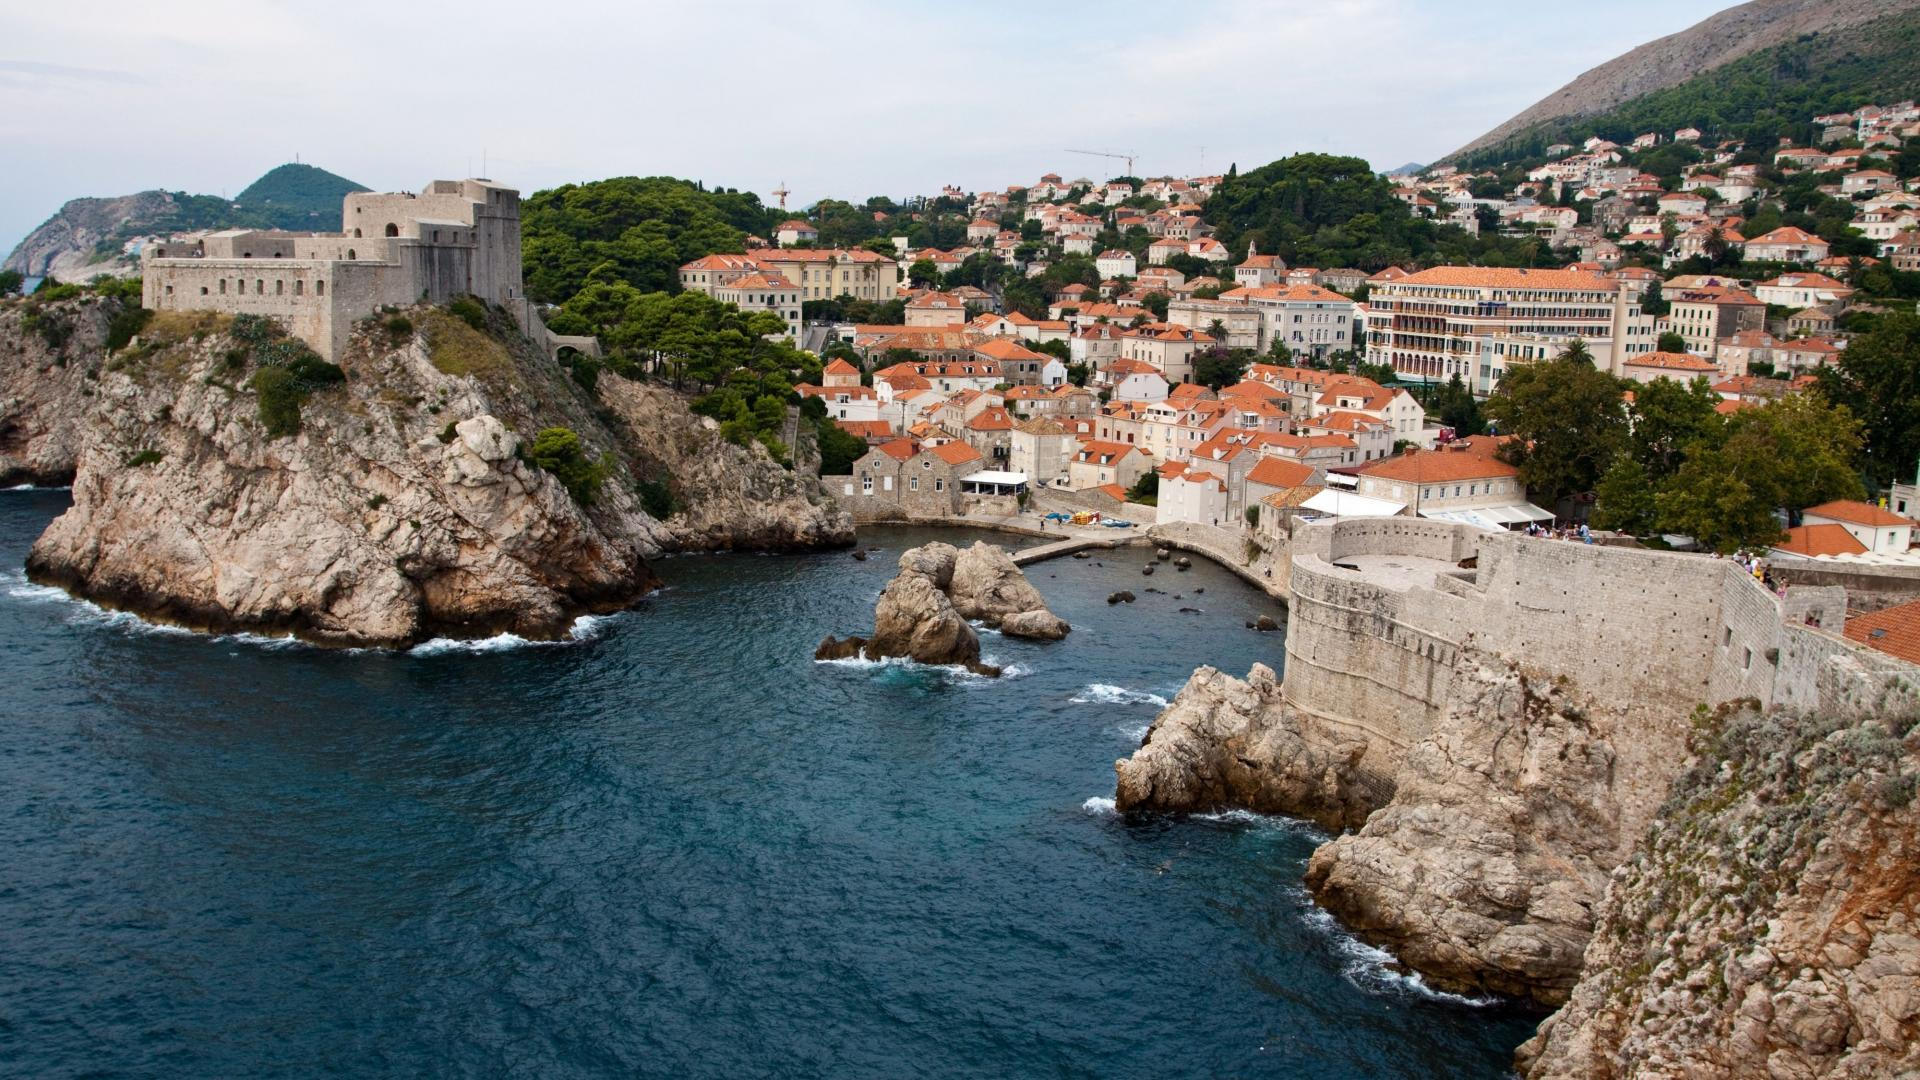 Dubrovnik full hd tapeta and t o 1920x1080 id 433226 for Best bath idaho